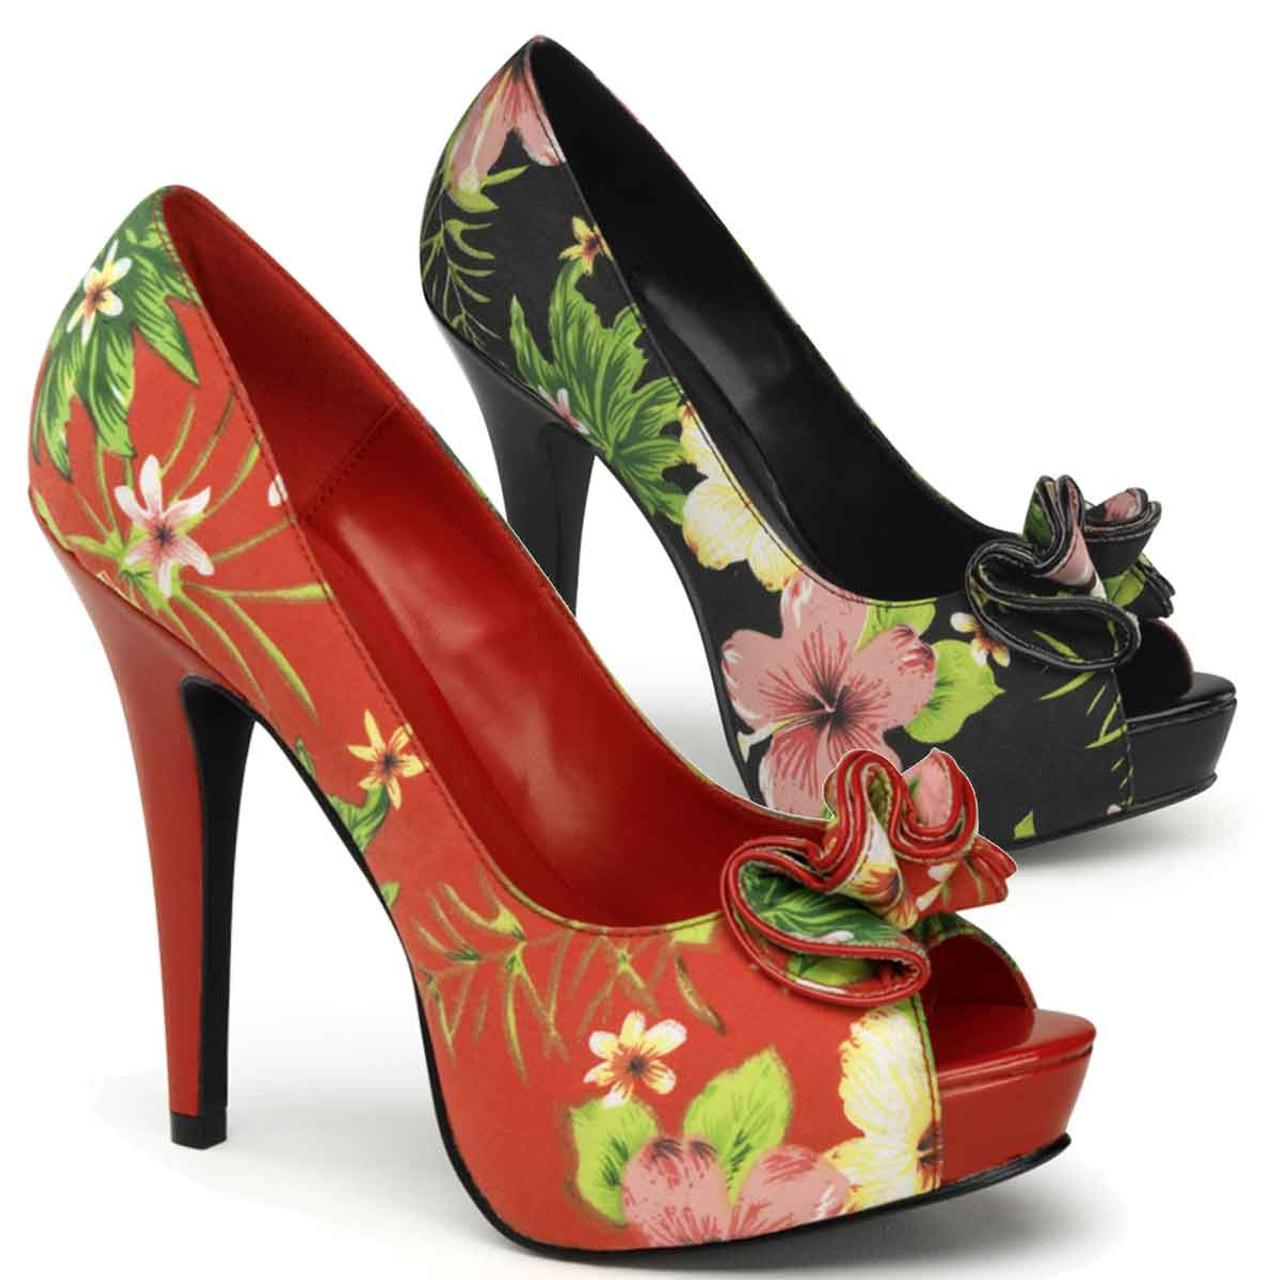 Pin Up Couture LOLITA-11 Peep Toe Platform Pump With Ruffle Detail At Toe